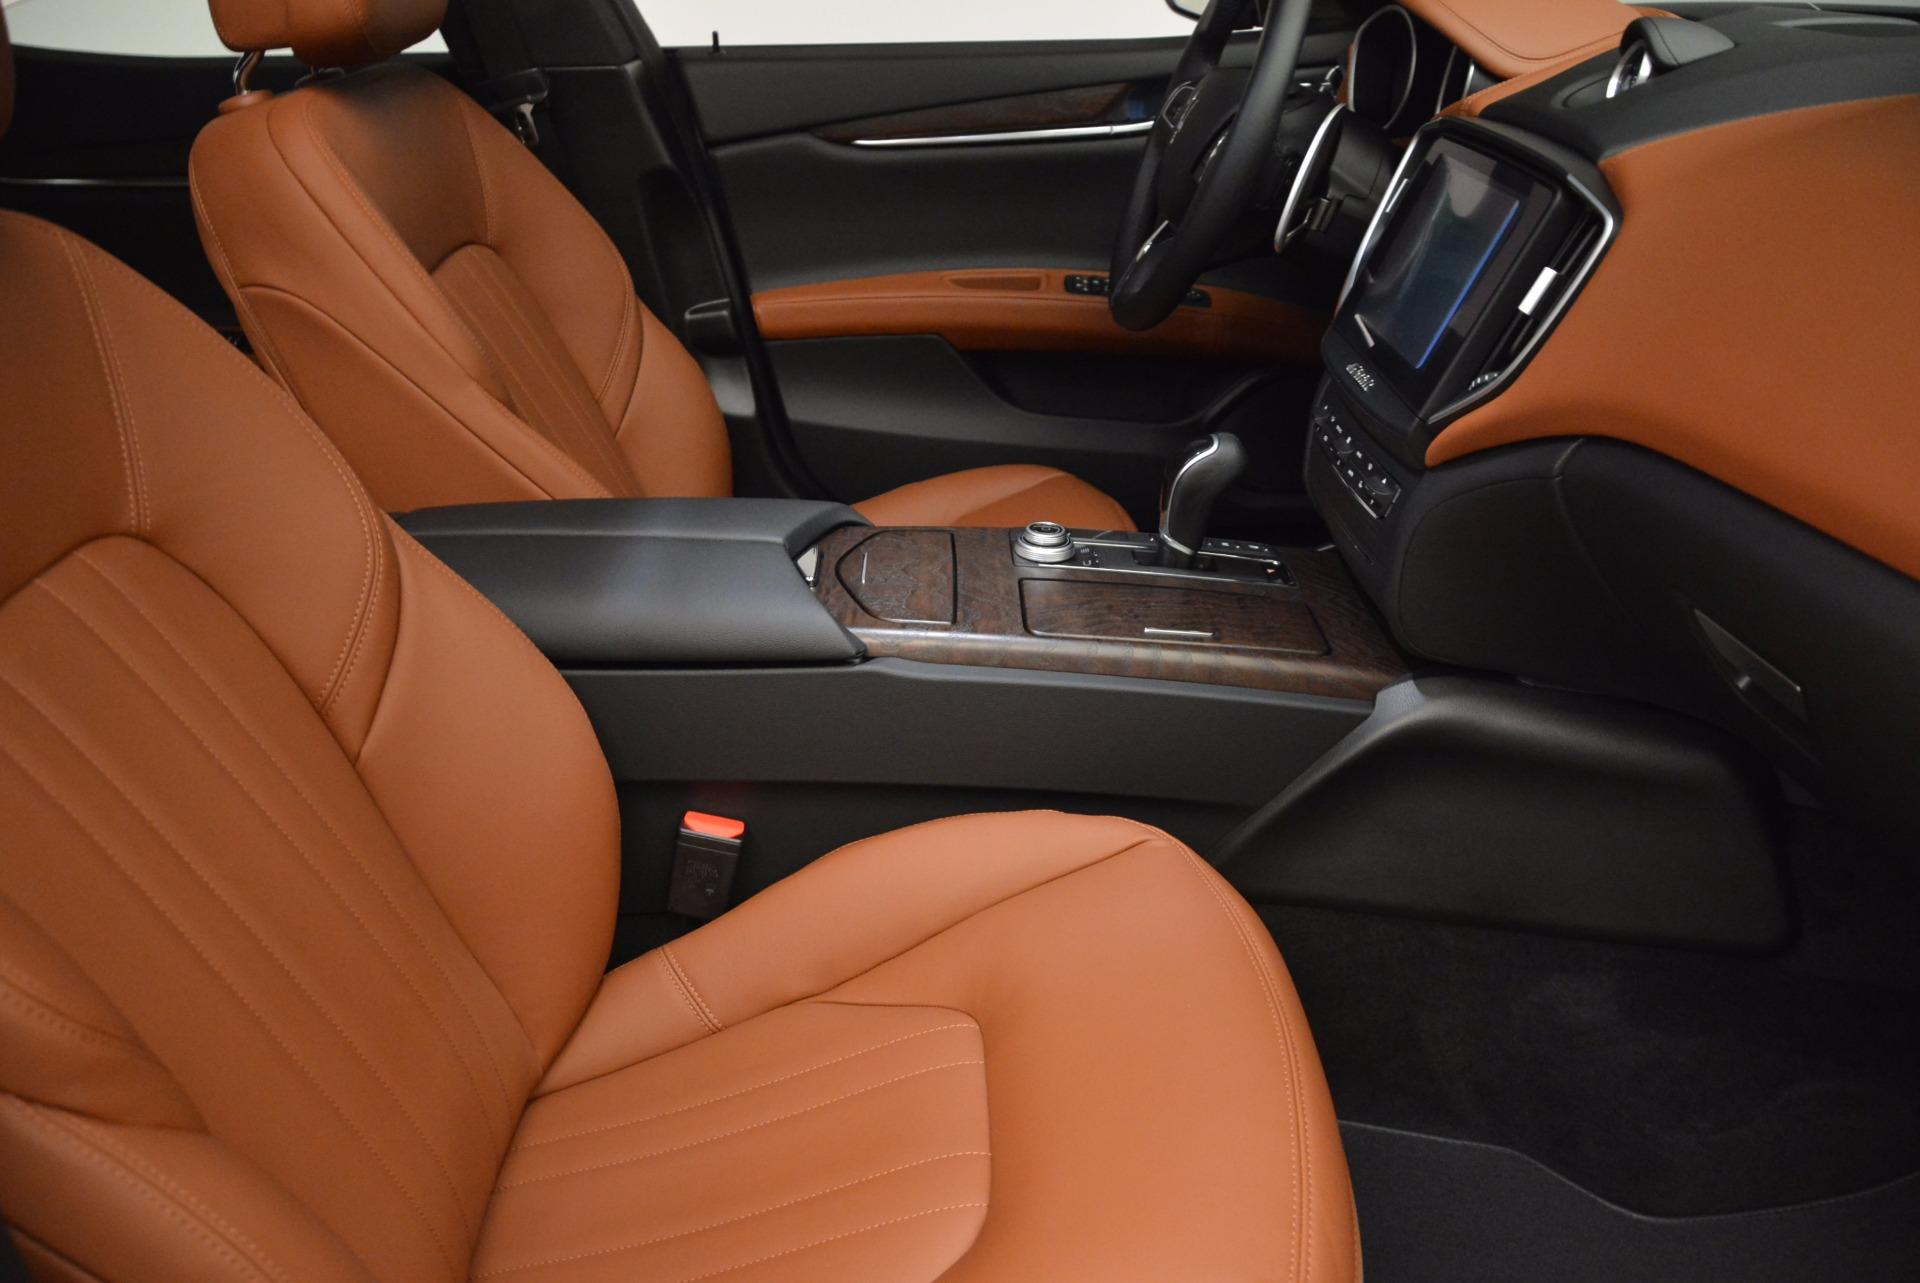 New 2017 Maserati Ghibli S Q4 EX-Loaner For Sale In Greenwich, CT 1018_p14